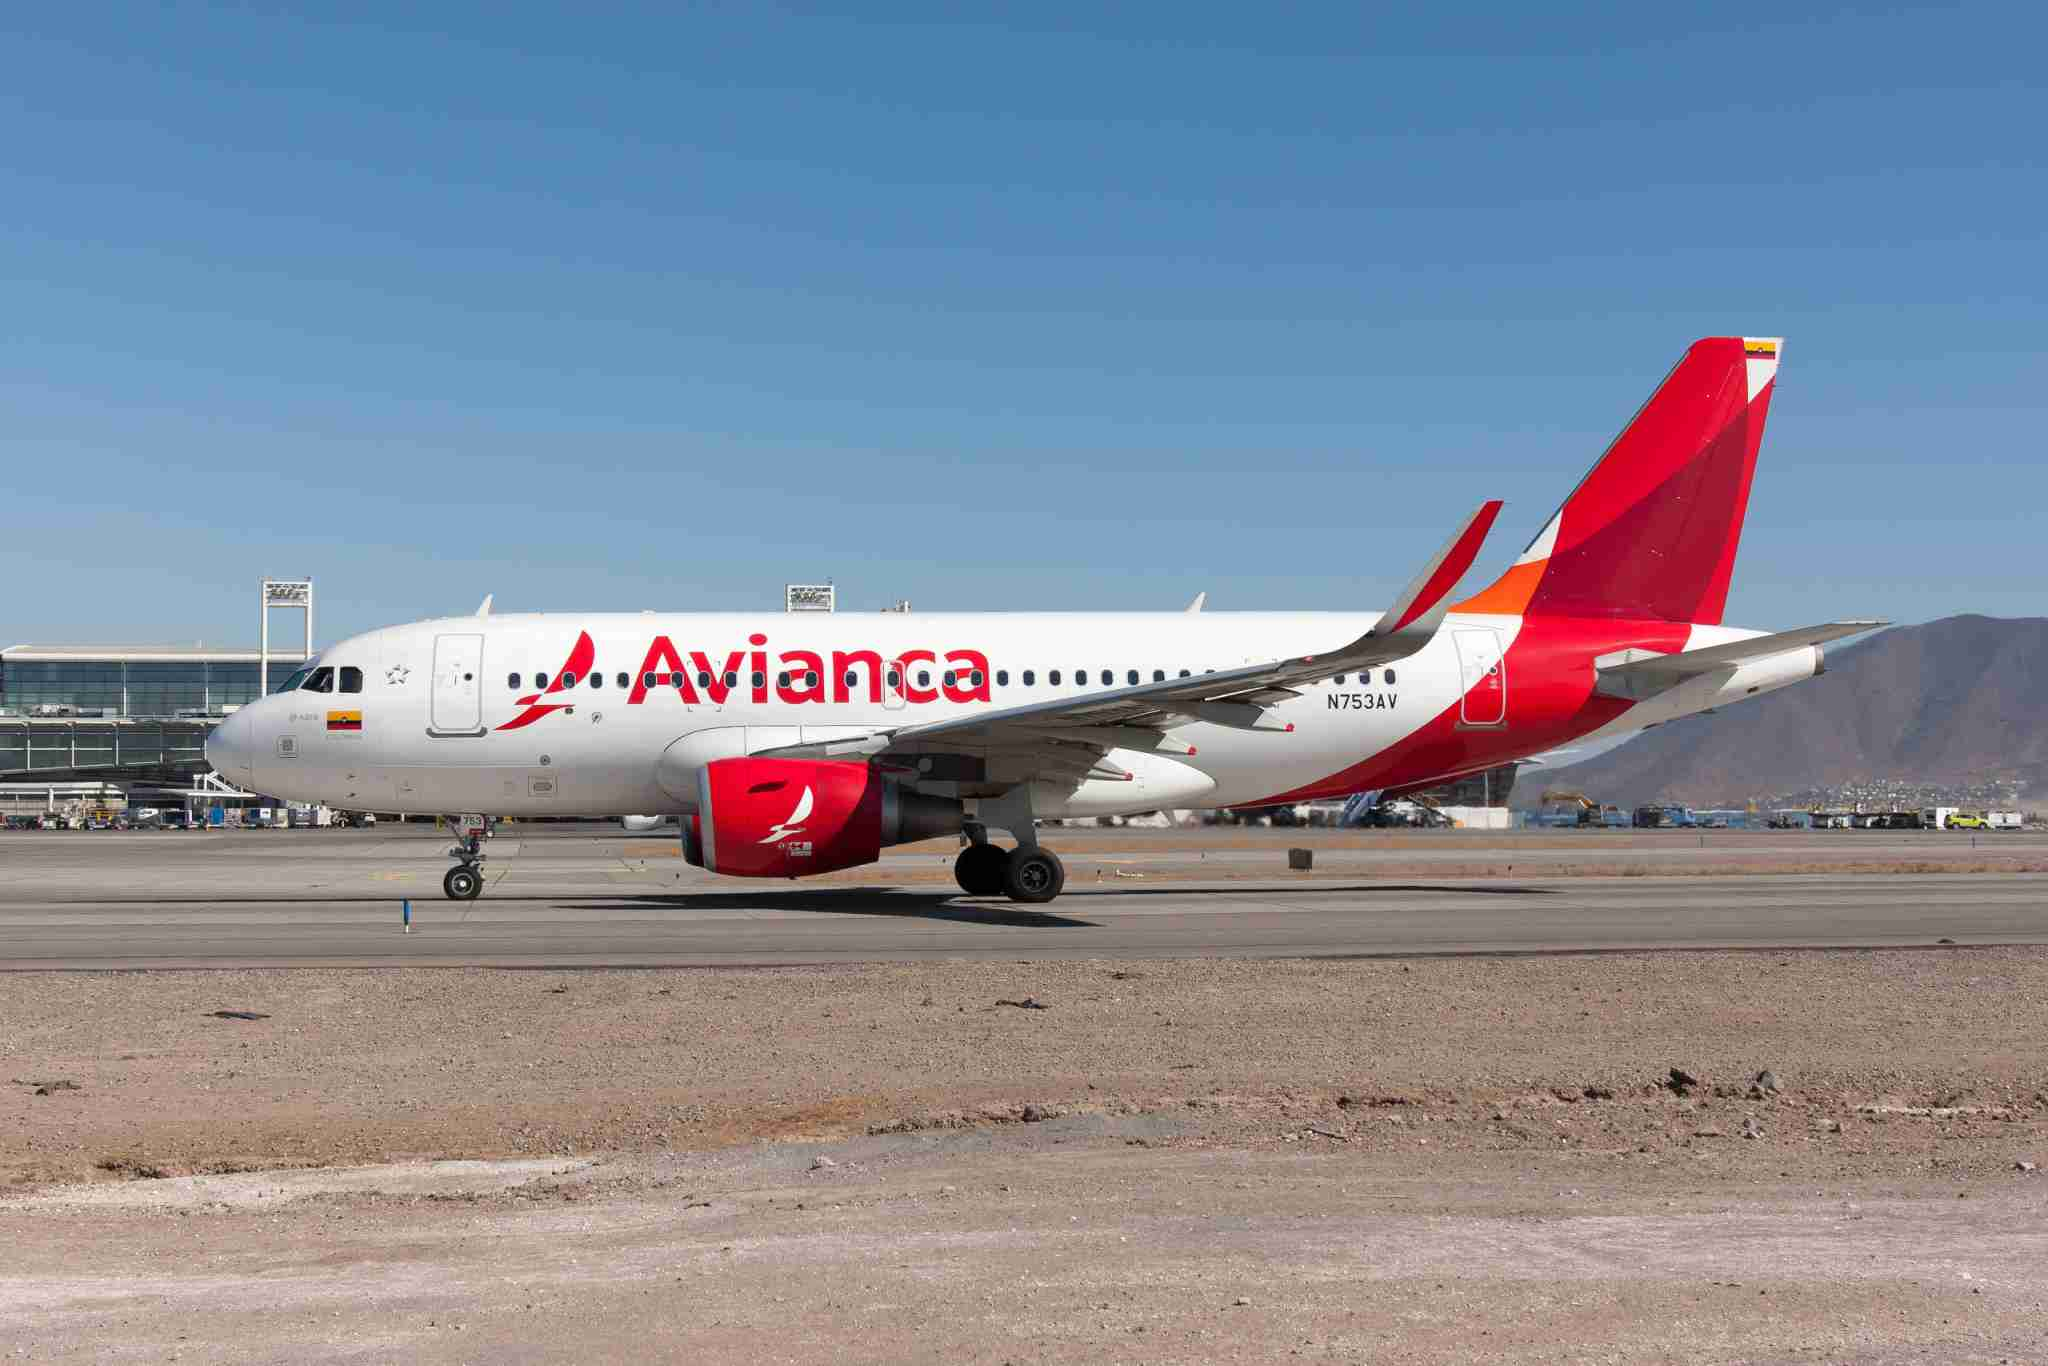 ARTURO MERINO BENITEZ AIRPORT, SANTIAGO, CHILE - 2019/03/19: An Avianca Airbus 319 taxiing at Santiago airport. (Photo by Fabrizio Gandolfo/SOPA Images/LightRocket via Getty Images)